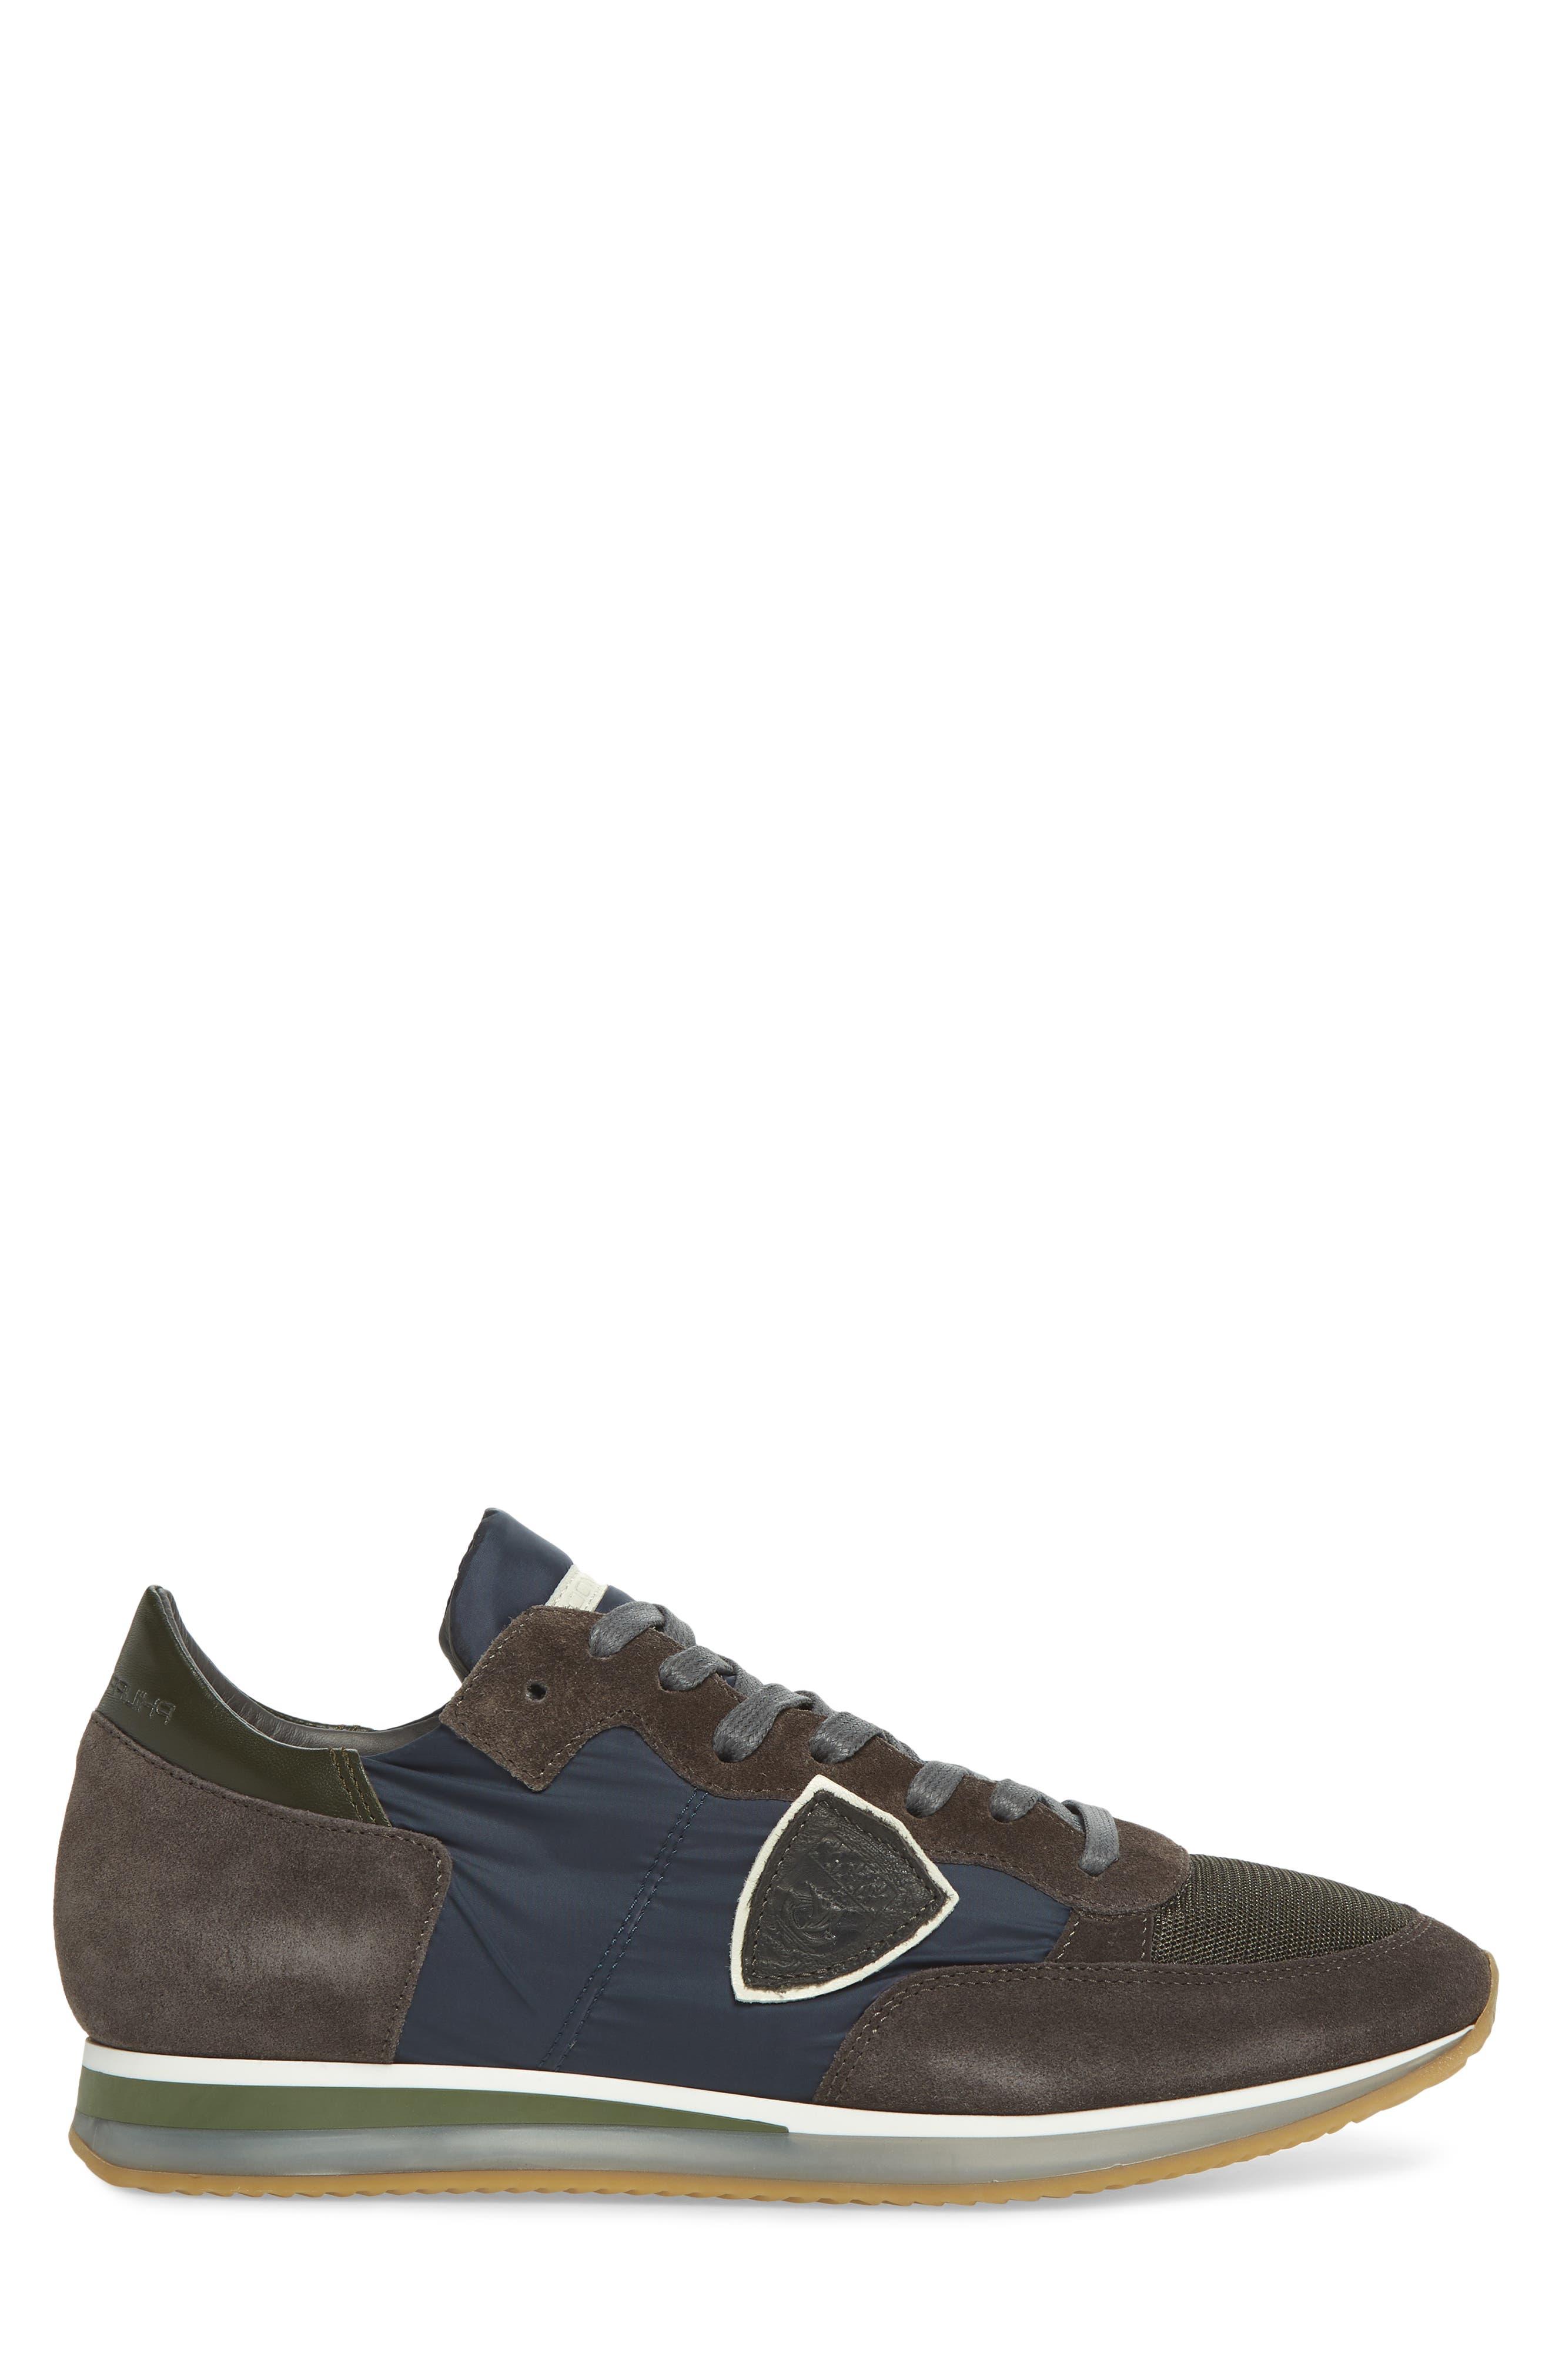 Tropez Low Top Sneaker,                             Alternate thumbnail 3, color,                             020